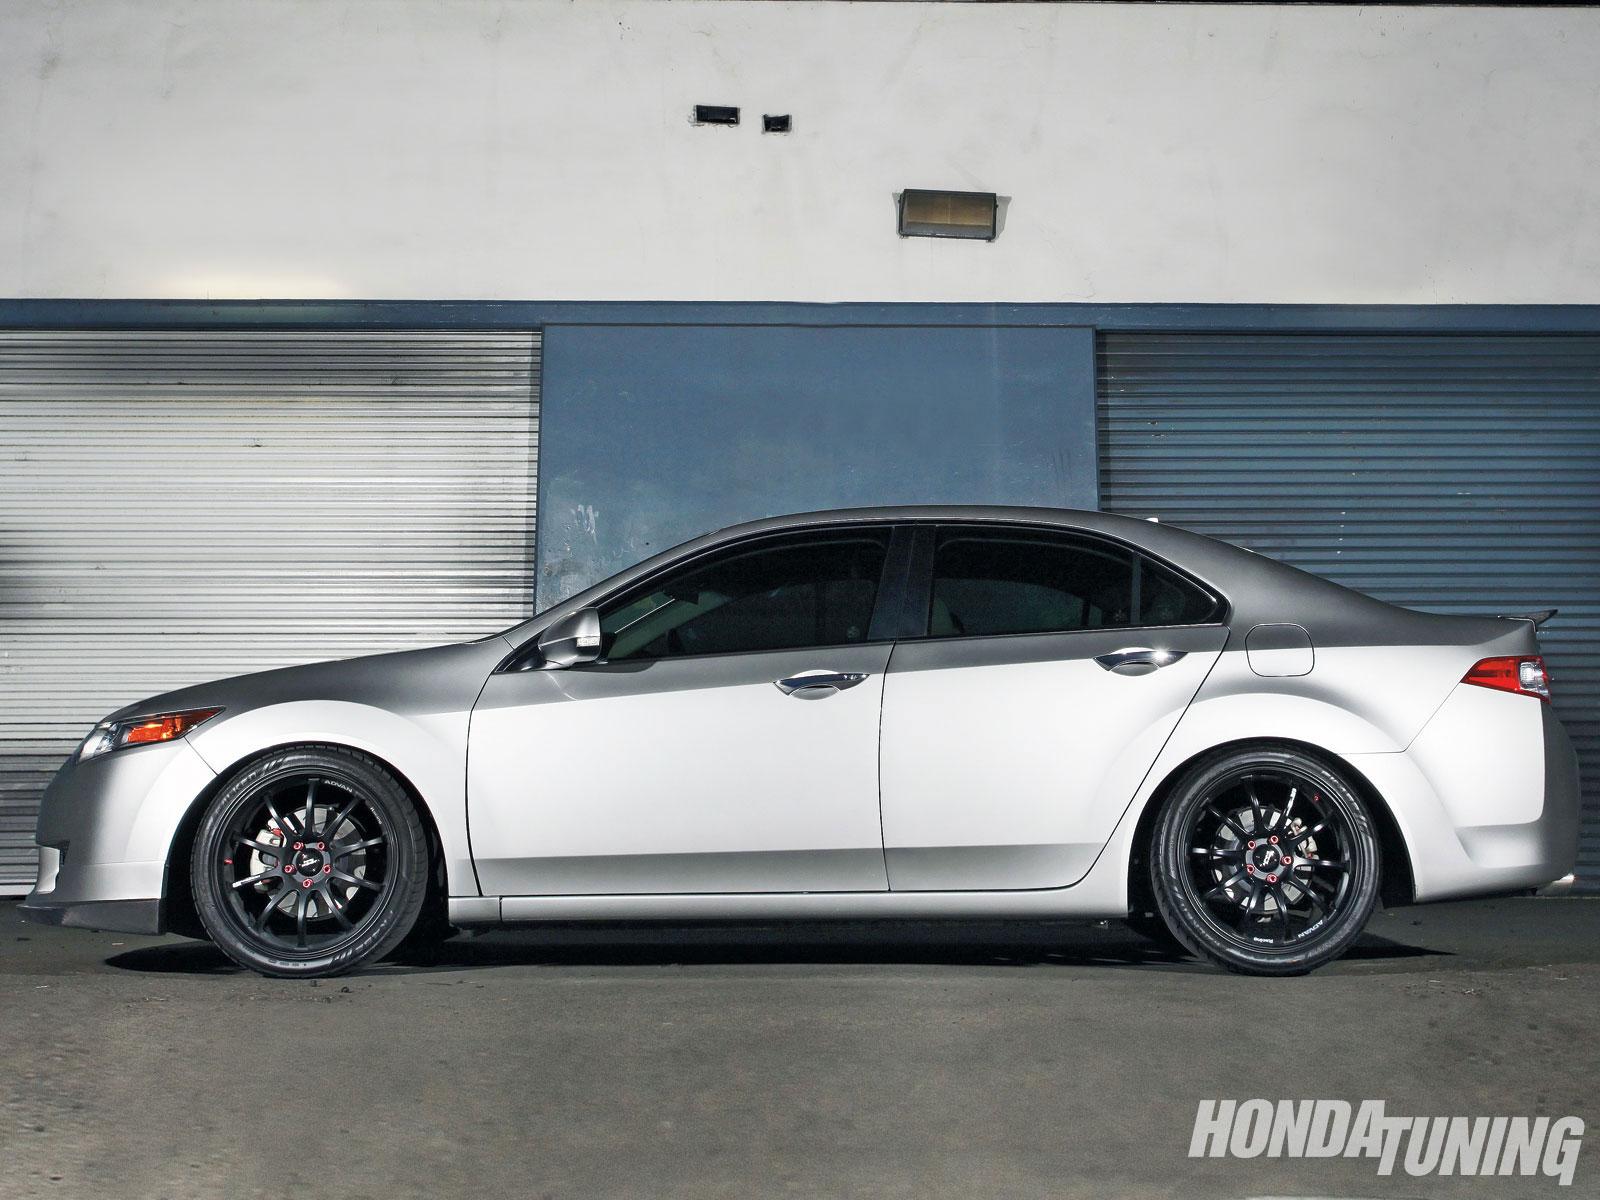 Acura TSX Project - Project TSX: FINAL - Honda Tuning Magazine